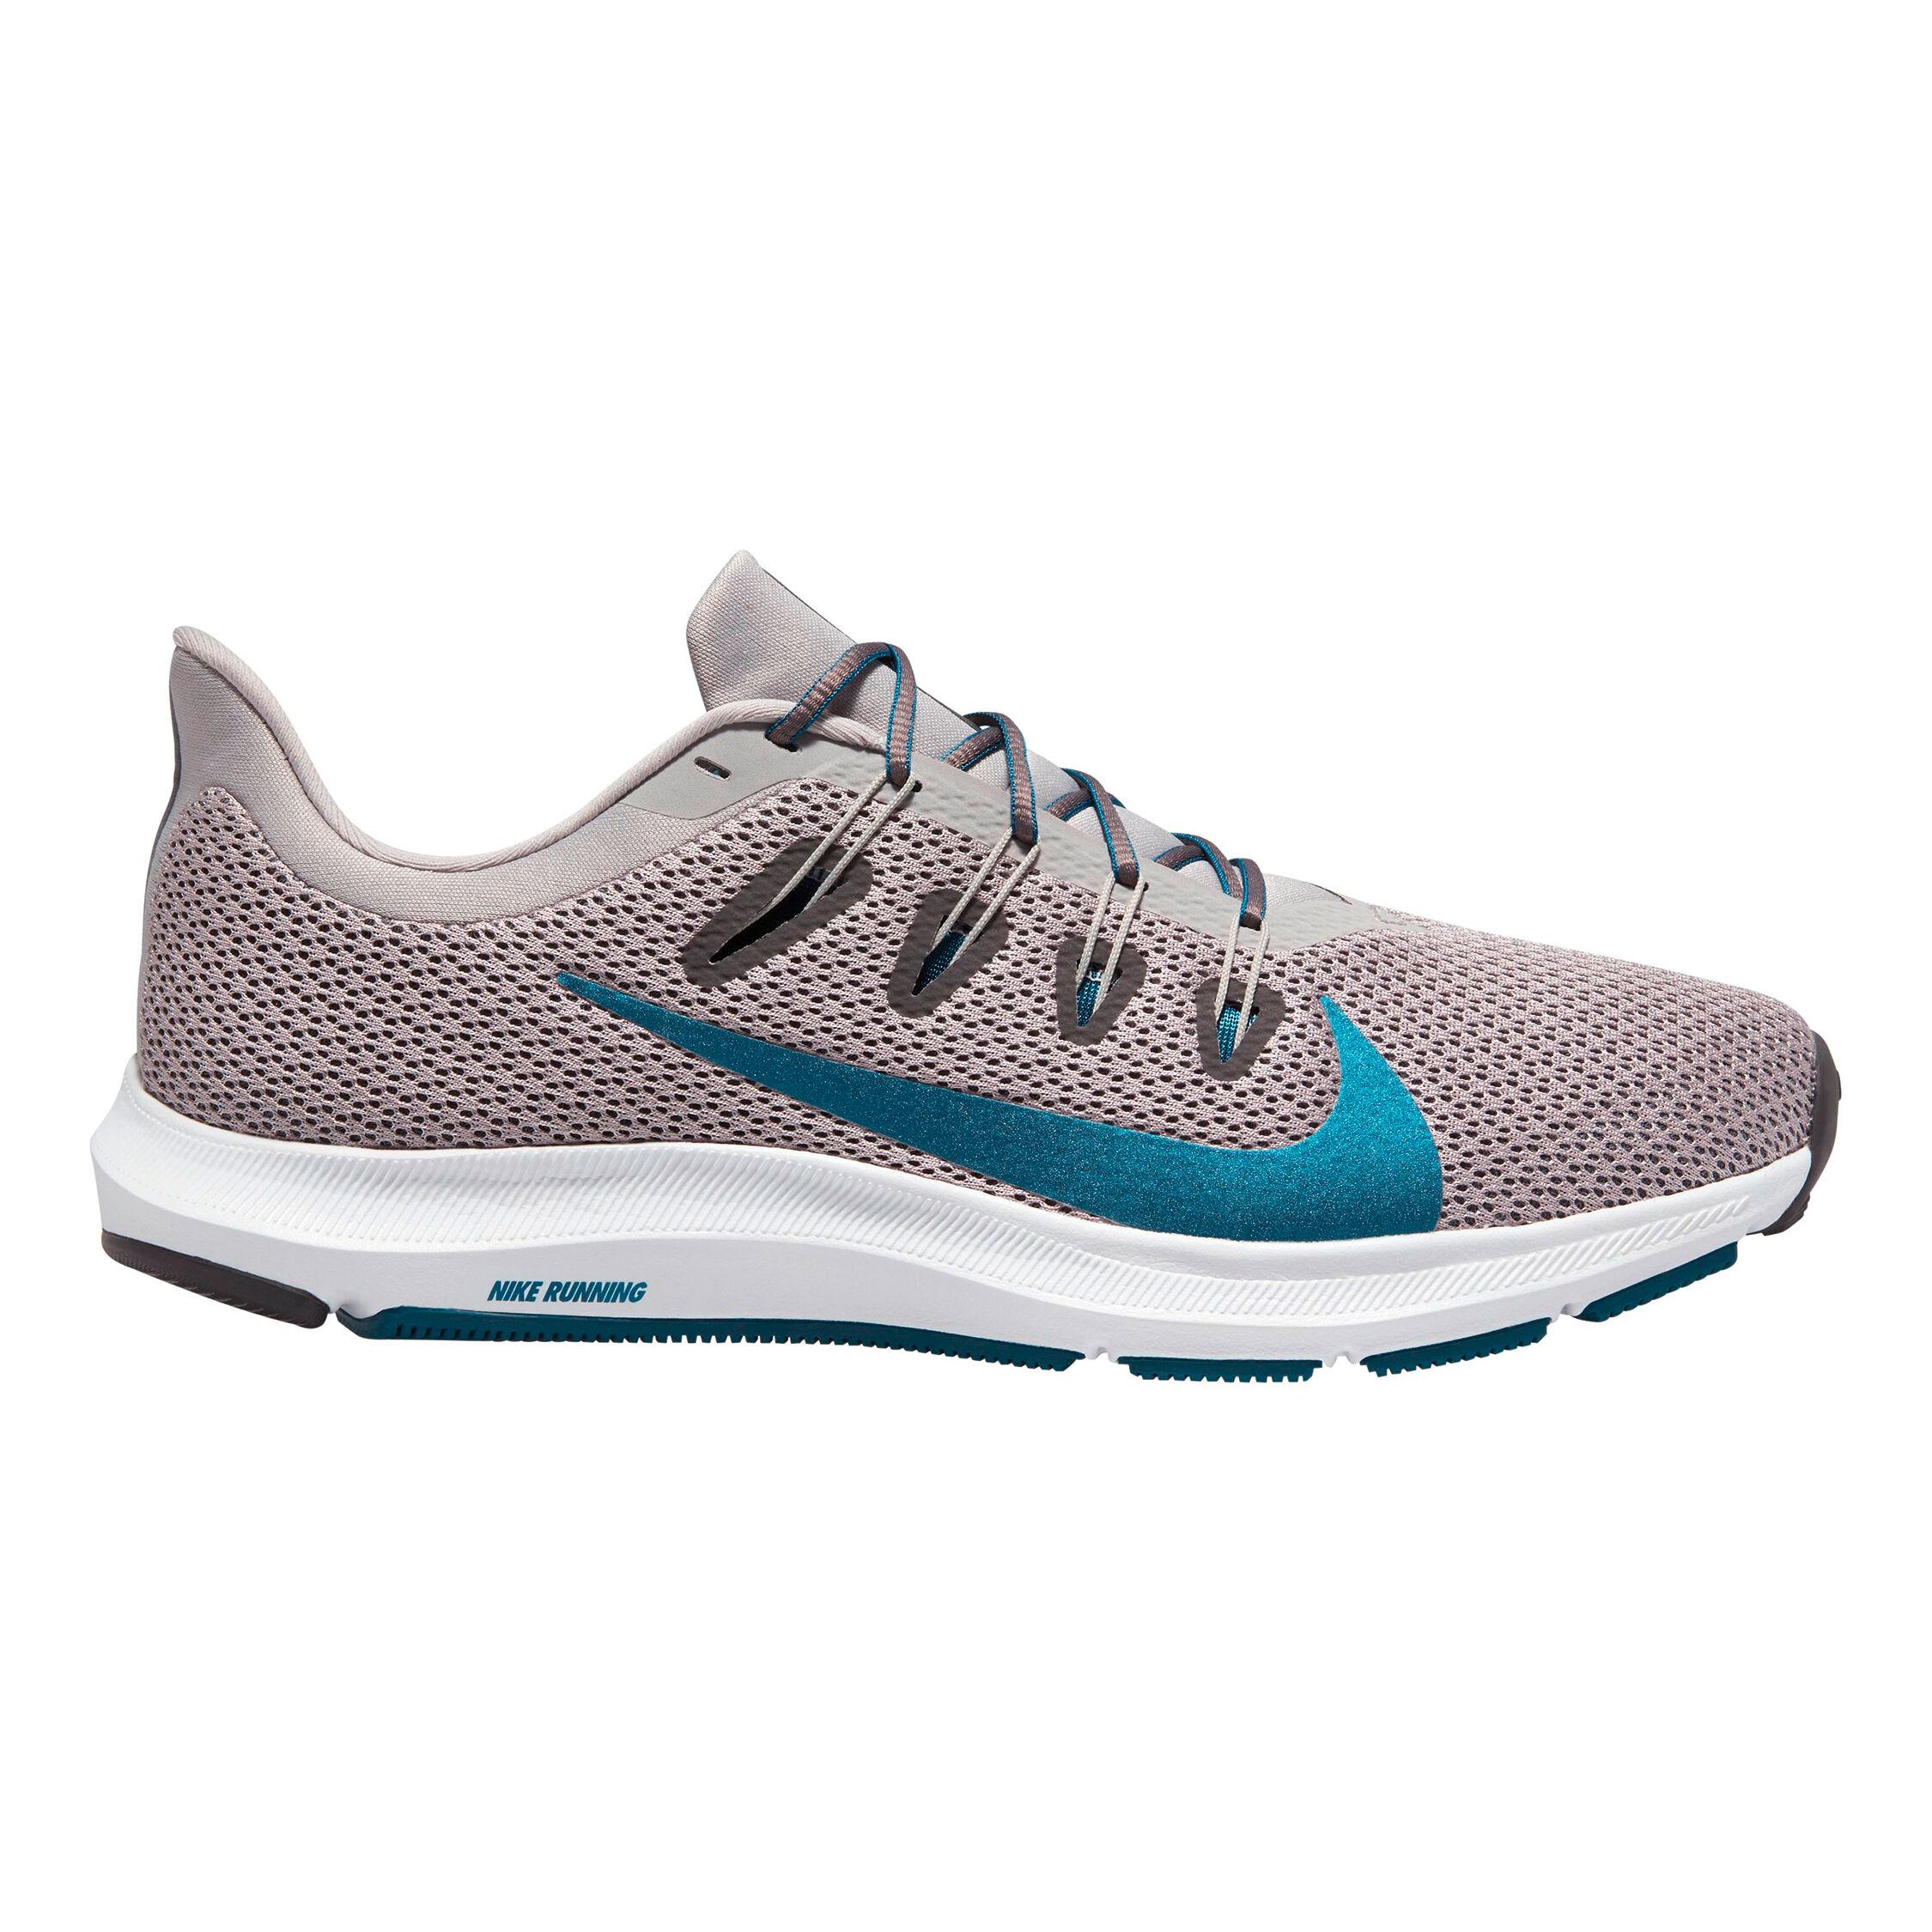 Großhandel Nike Epic React Flyknit 2 Laufschuhe Damen weiß